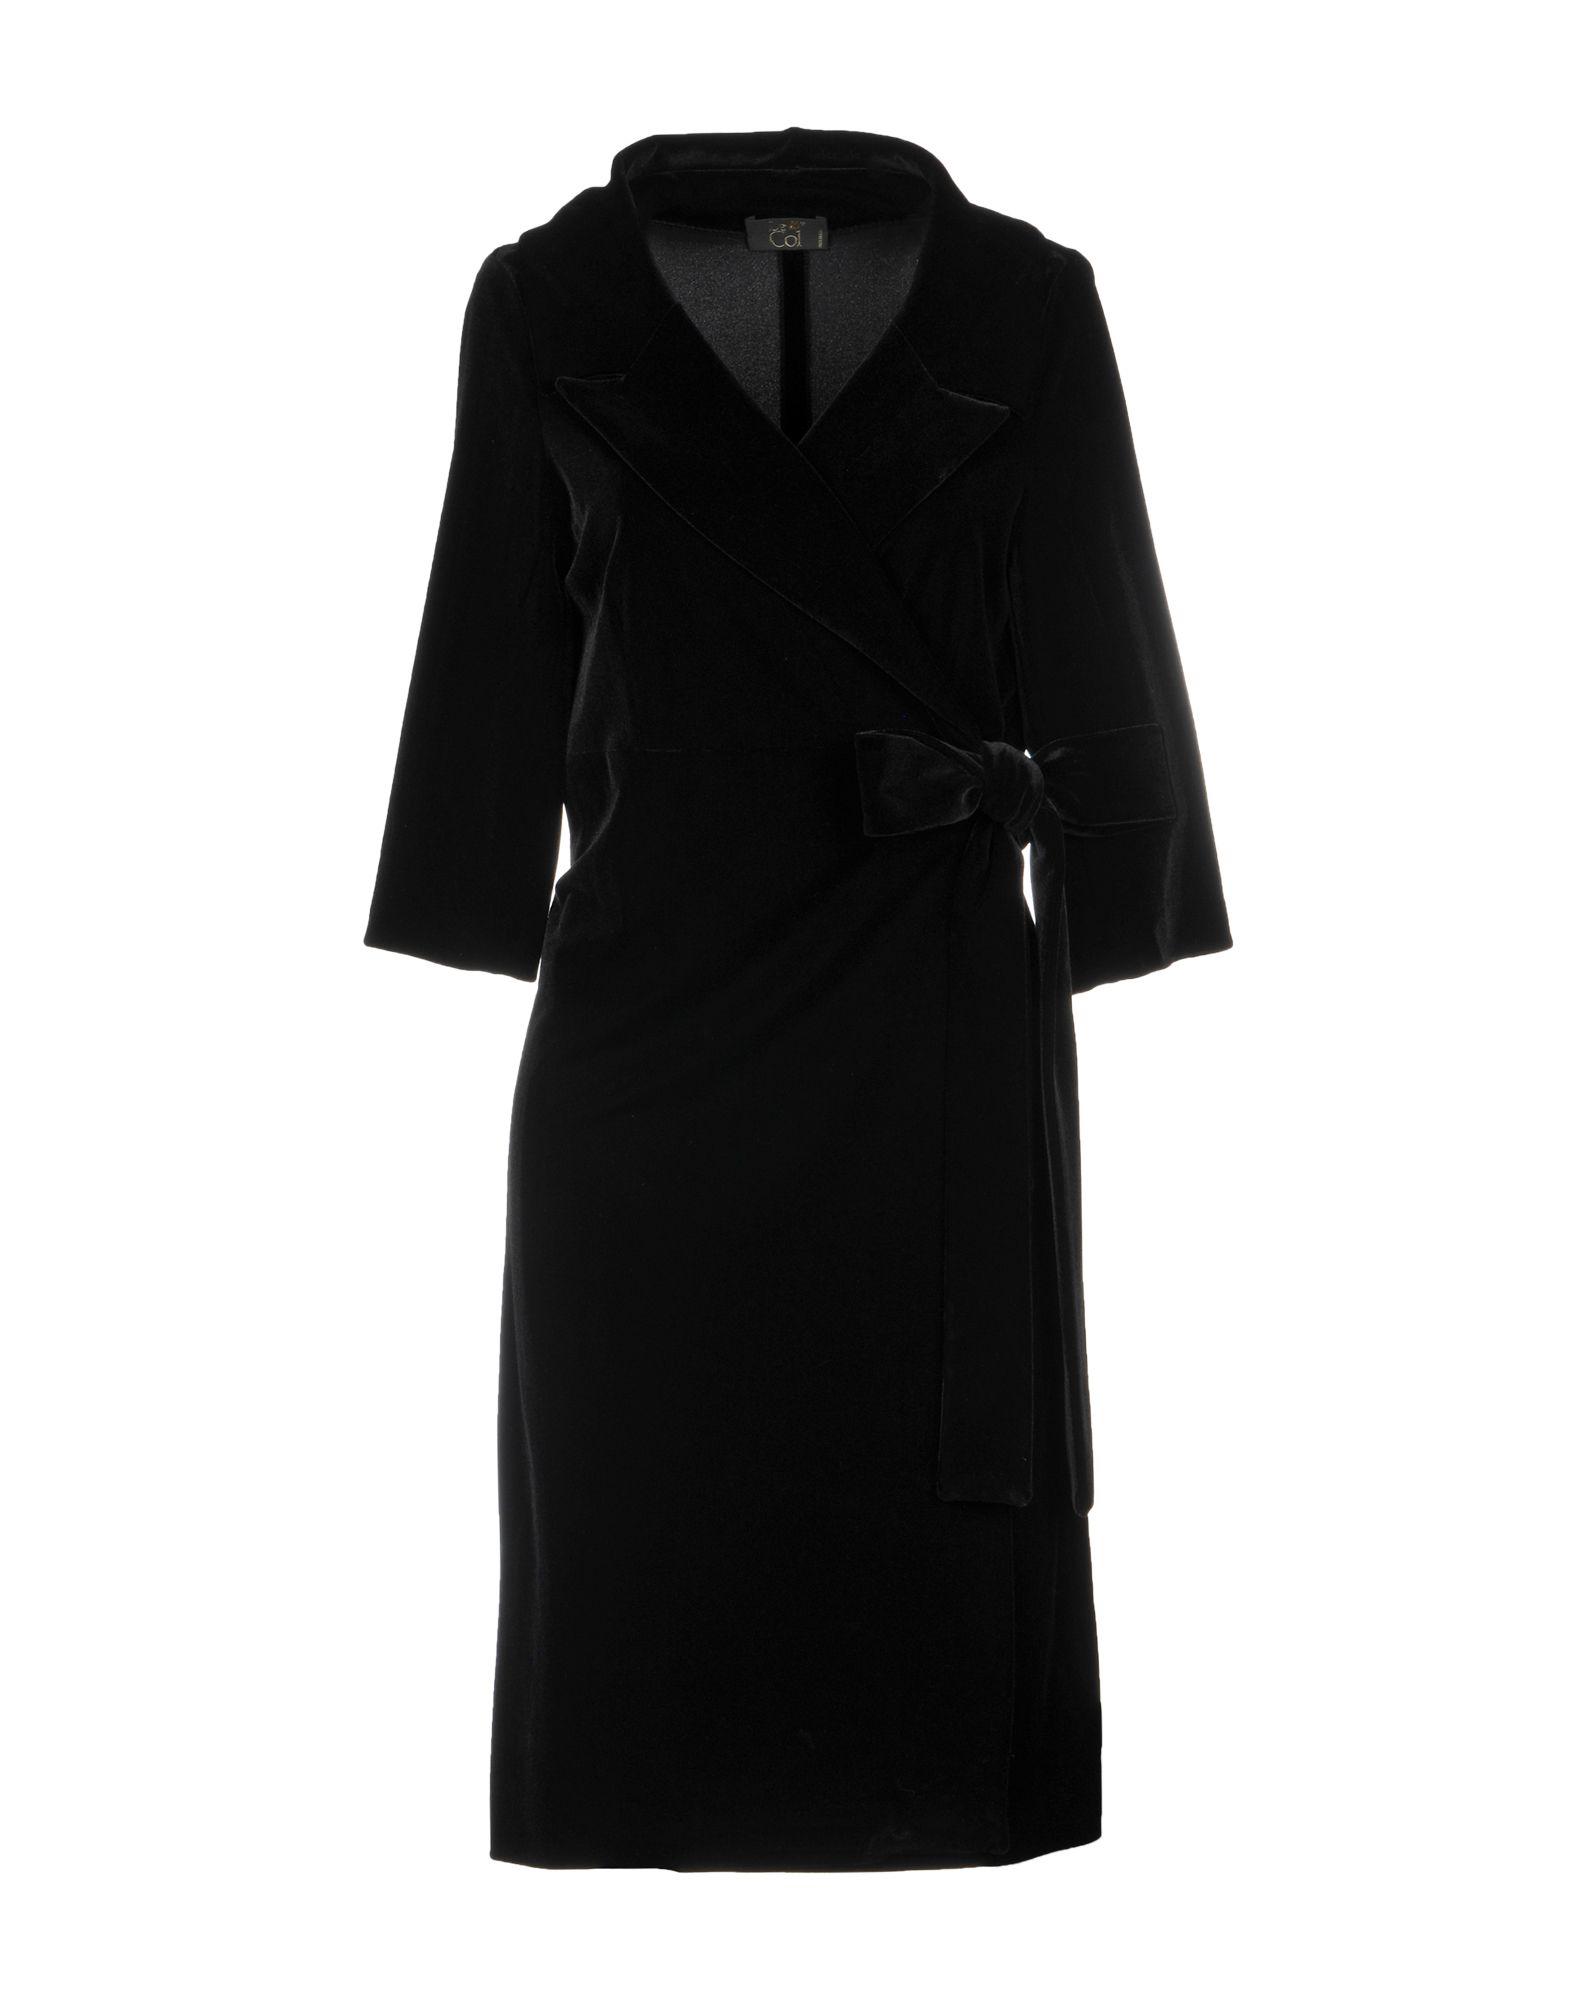 LE COL Short Dress in Black